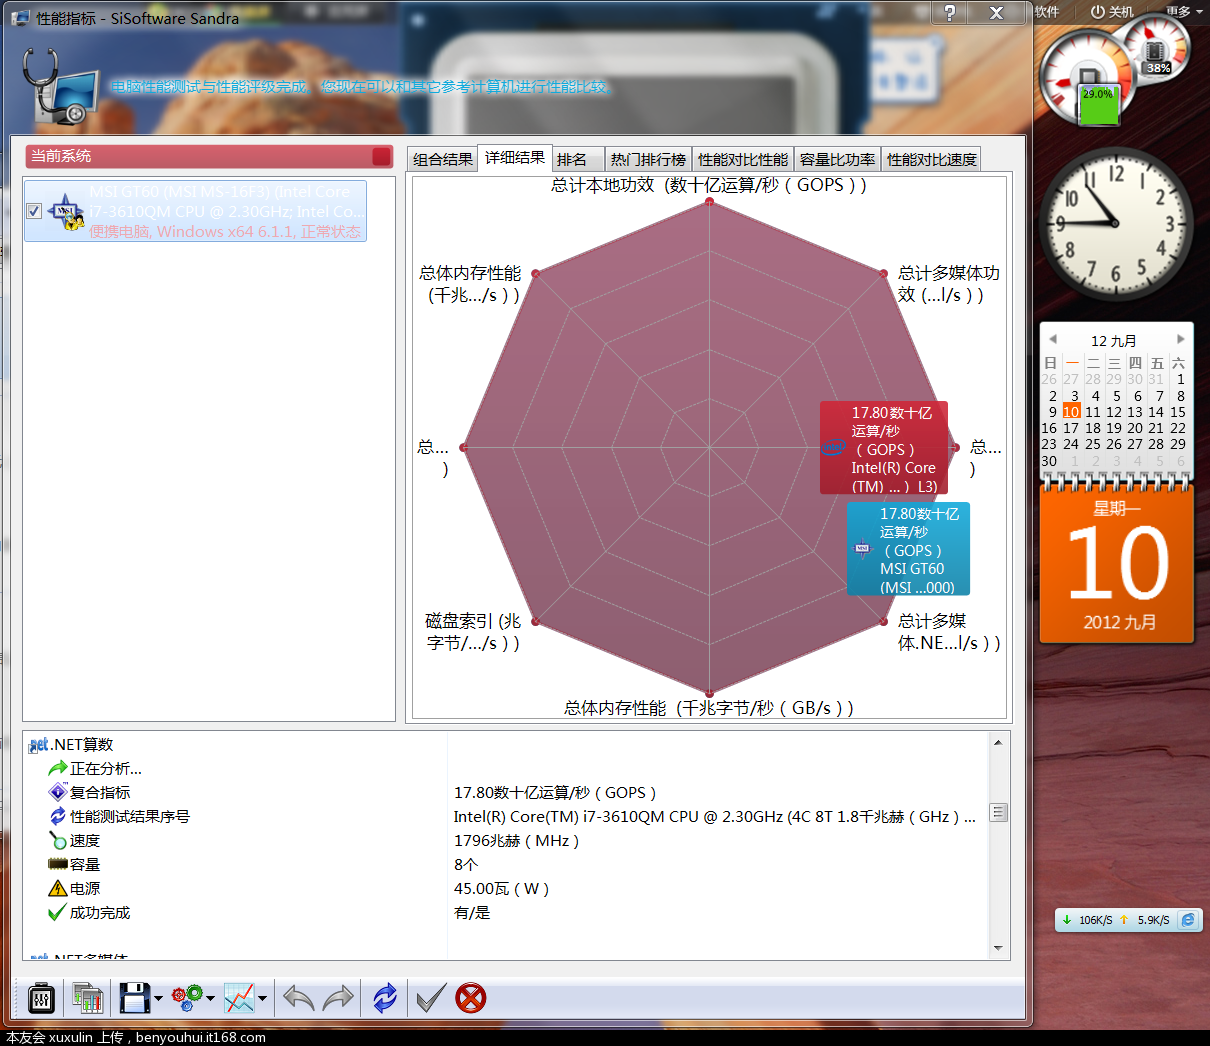 Sisoftware Sandra 截图5.PNG